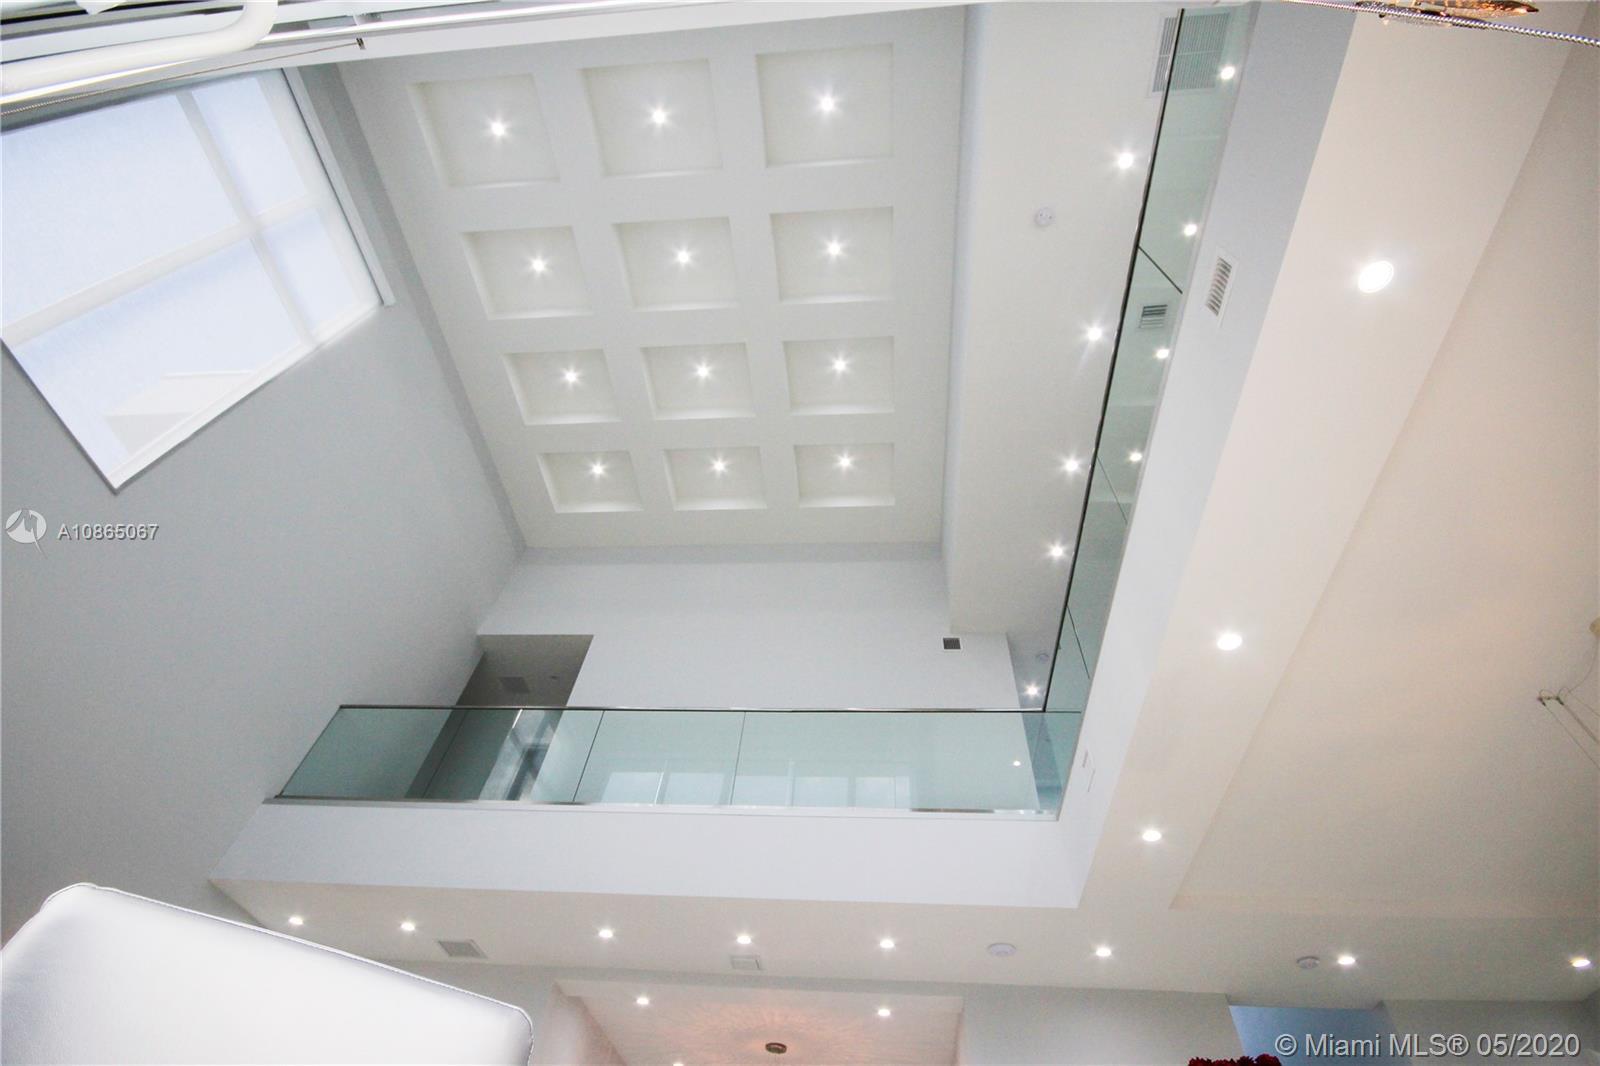 Vaulted ceilings.